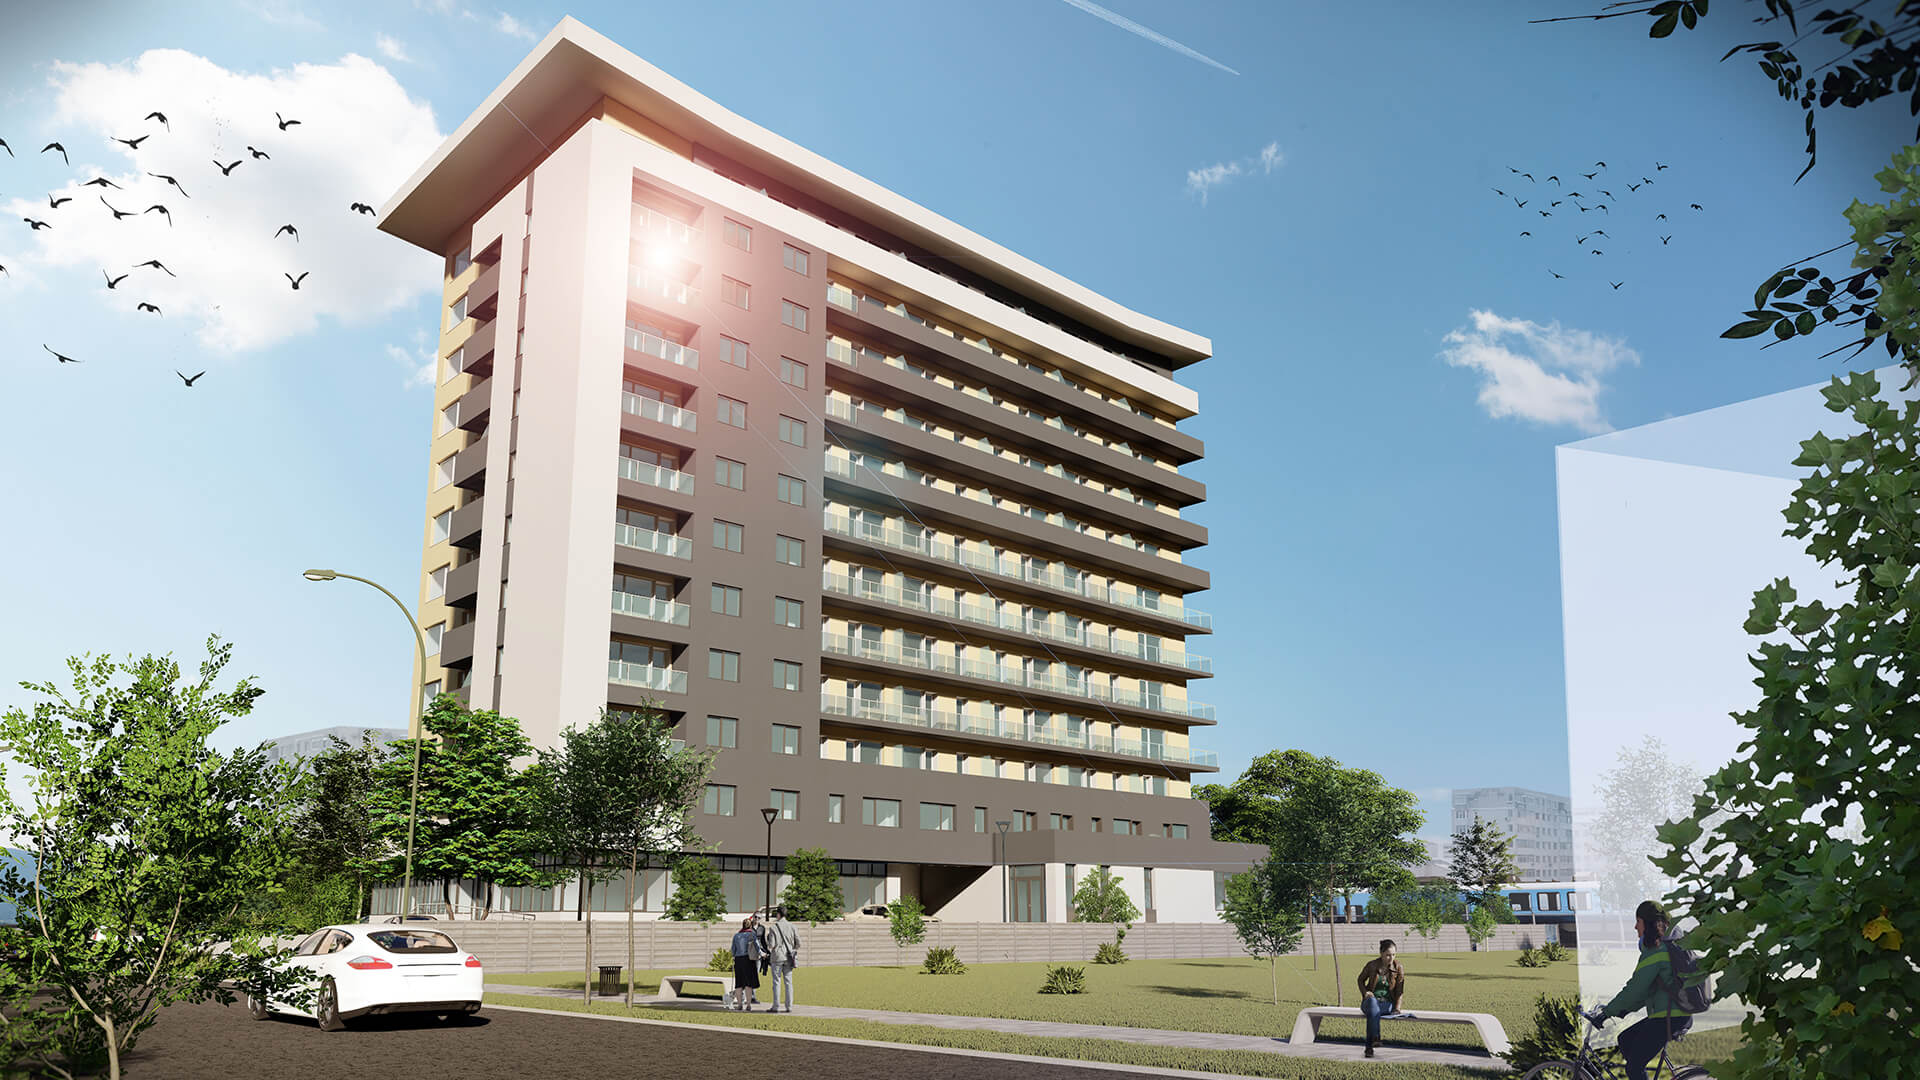 apartamente_noi_iasi_galata-nicolina_dezvoltator_cu_experienta_02